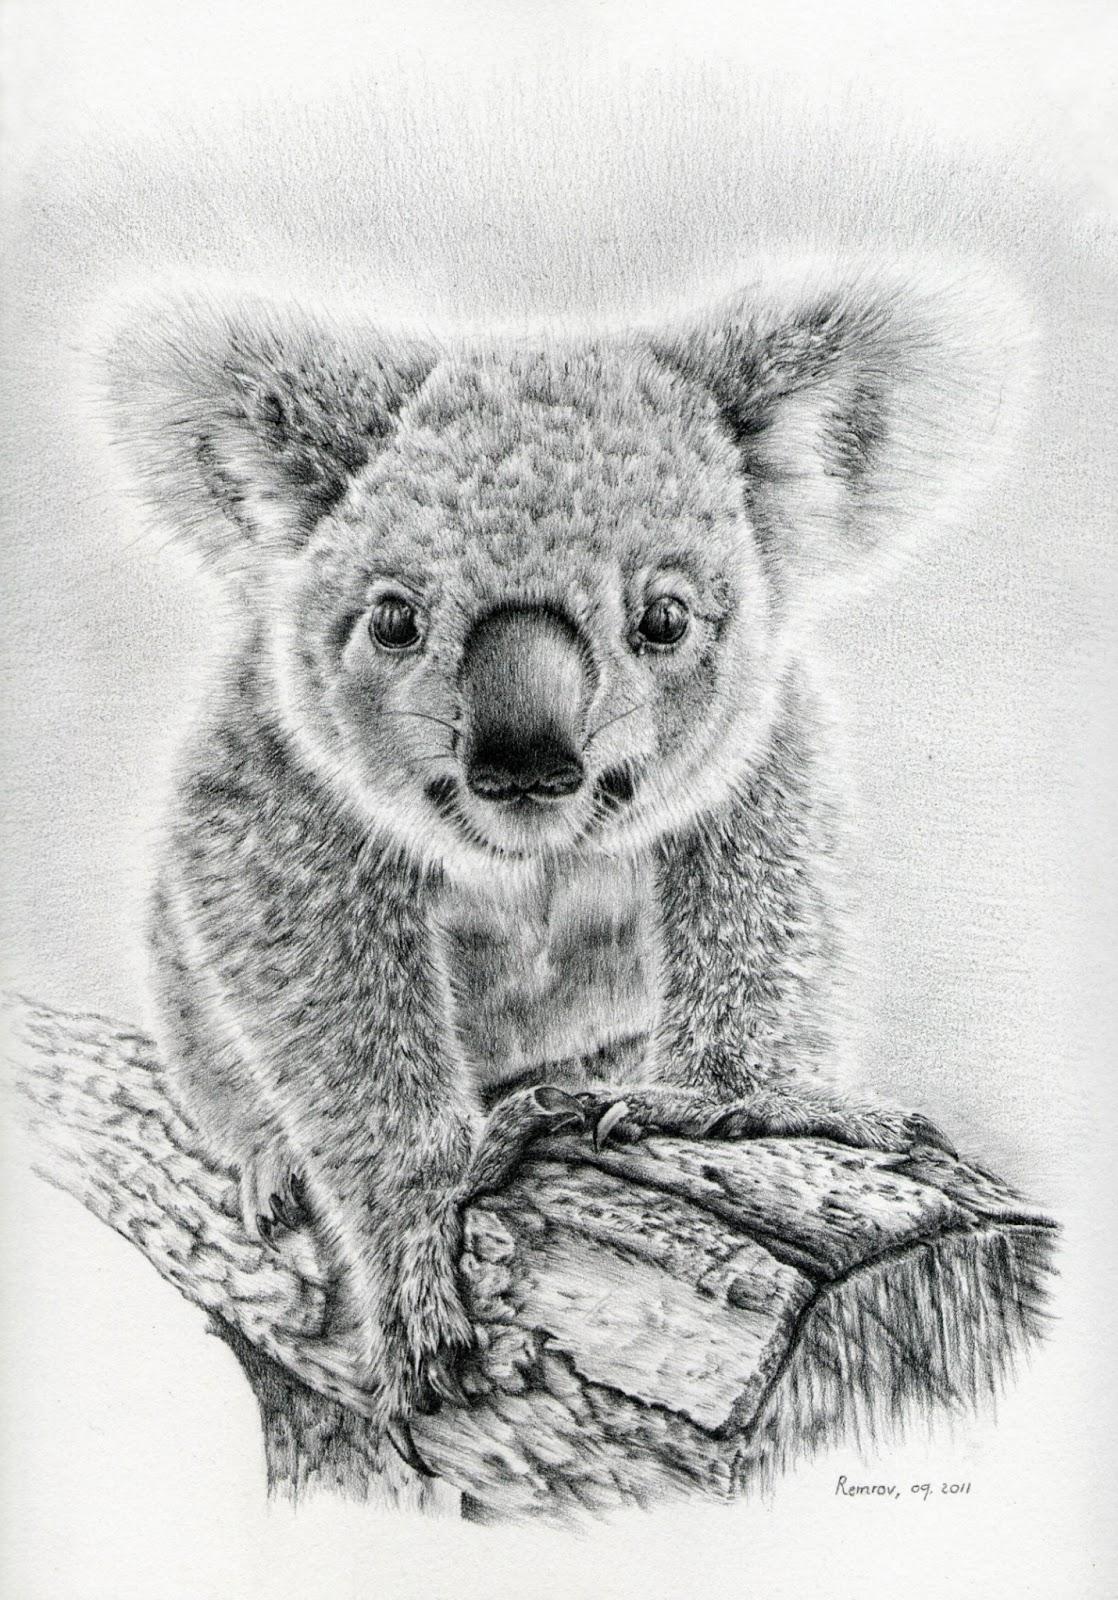 Remrov's Autistic Artblurbs: Koala Art, a project to help ...